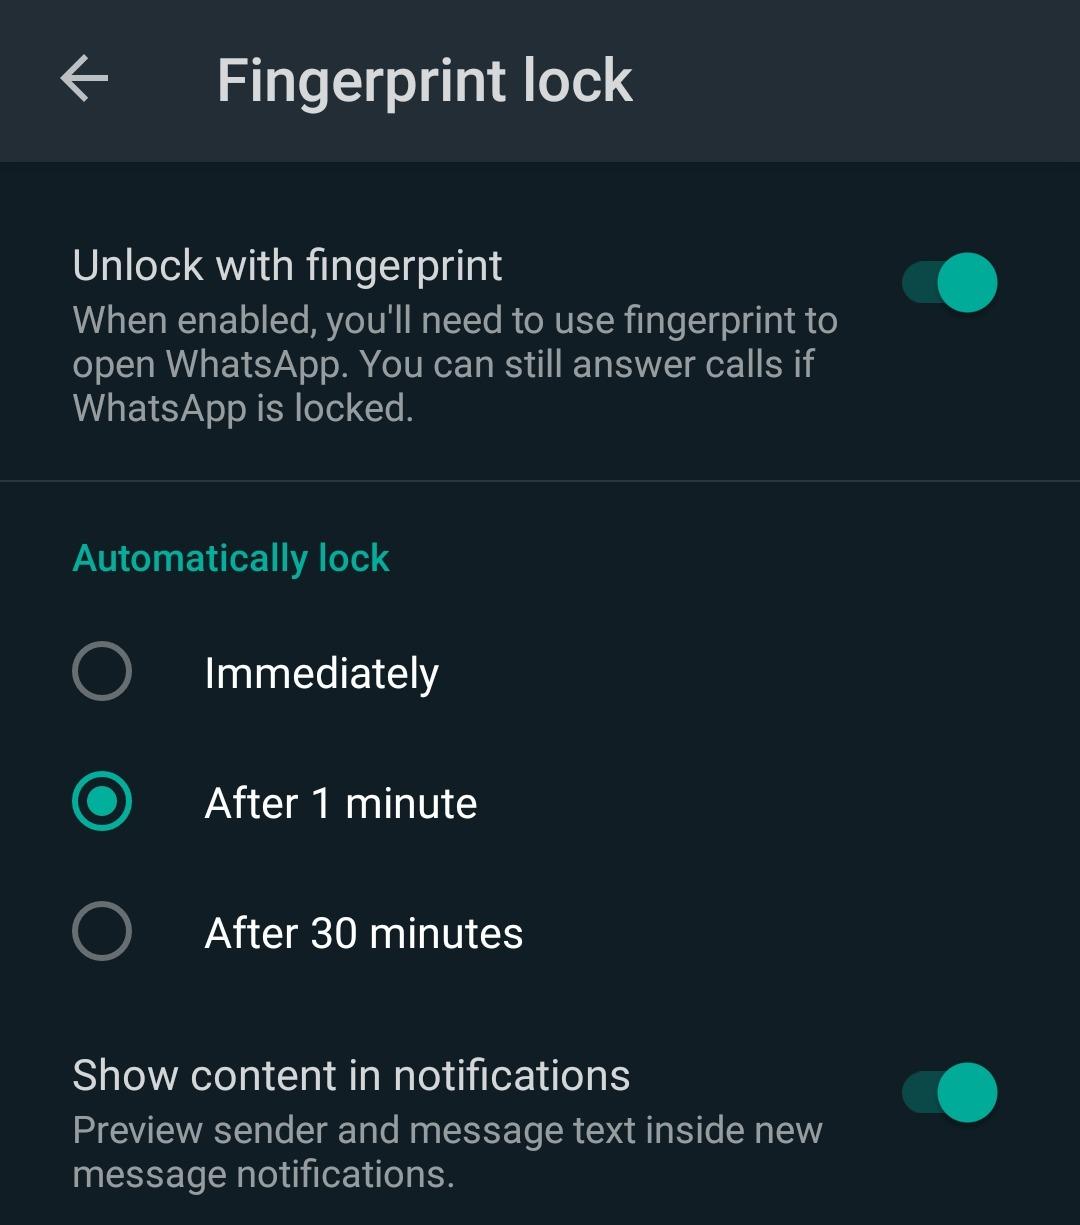 How to lock WhatsApp with fingerprint